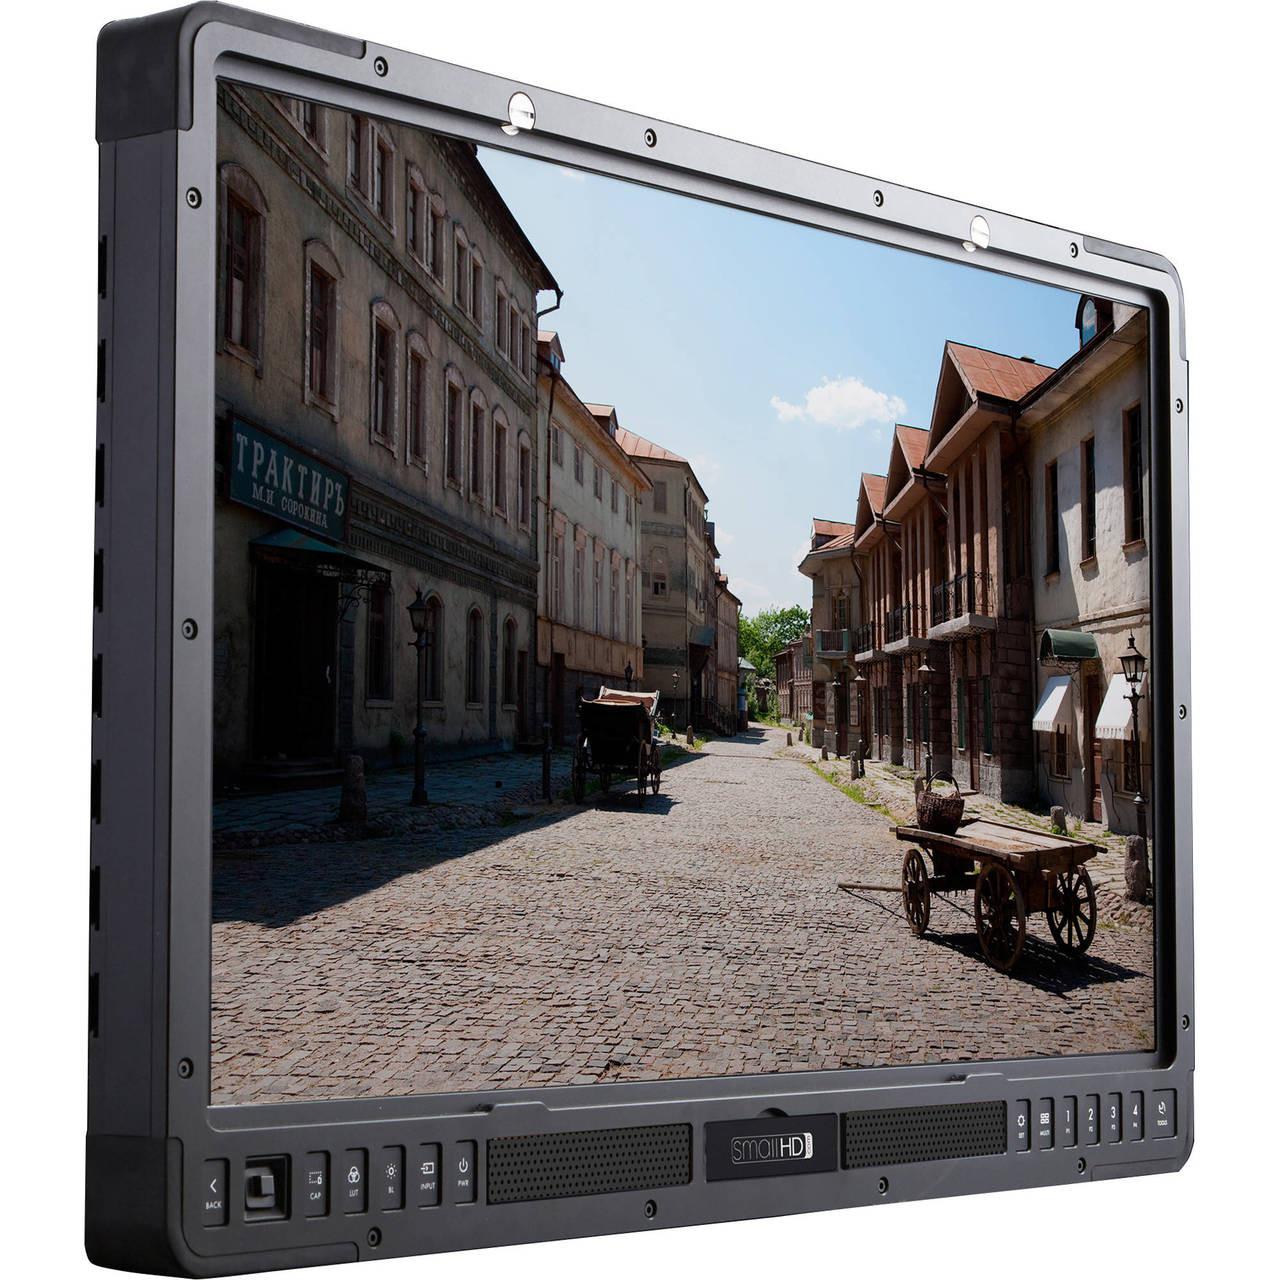 SmallHD 2403 HDR 24